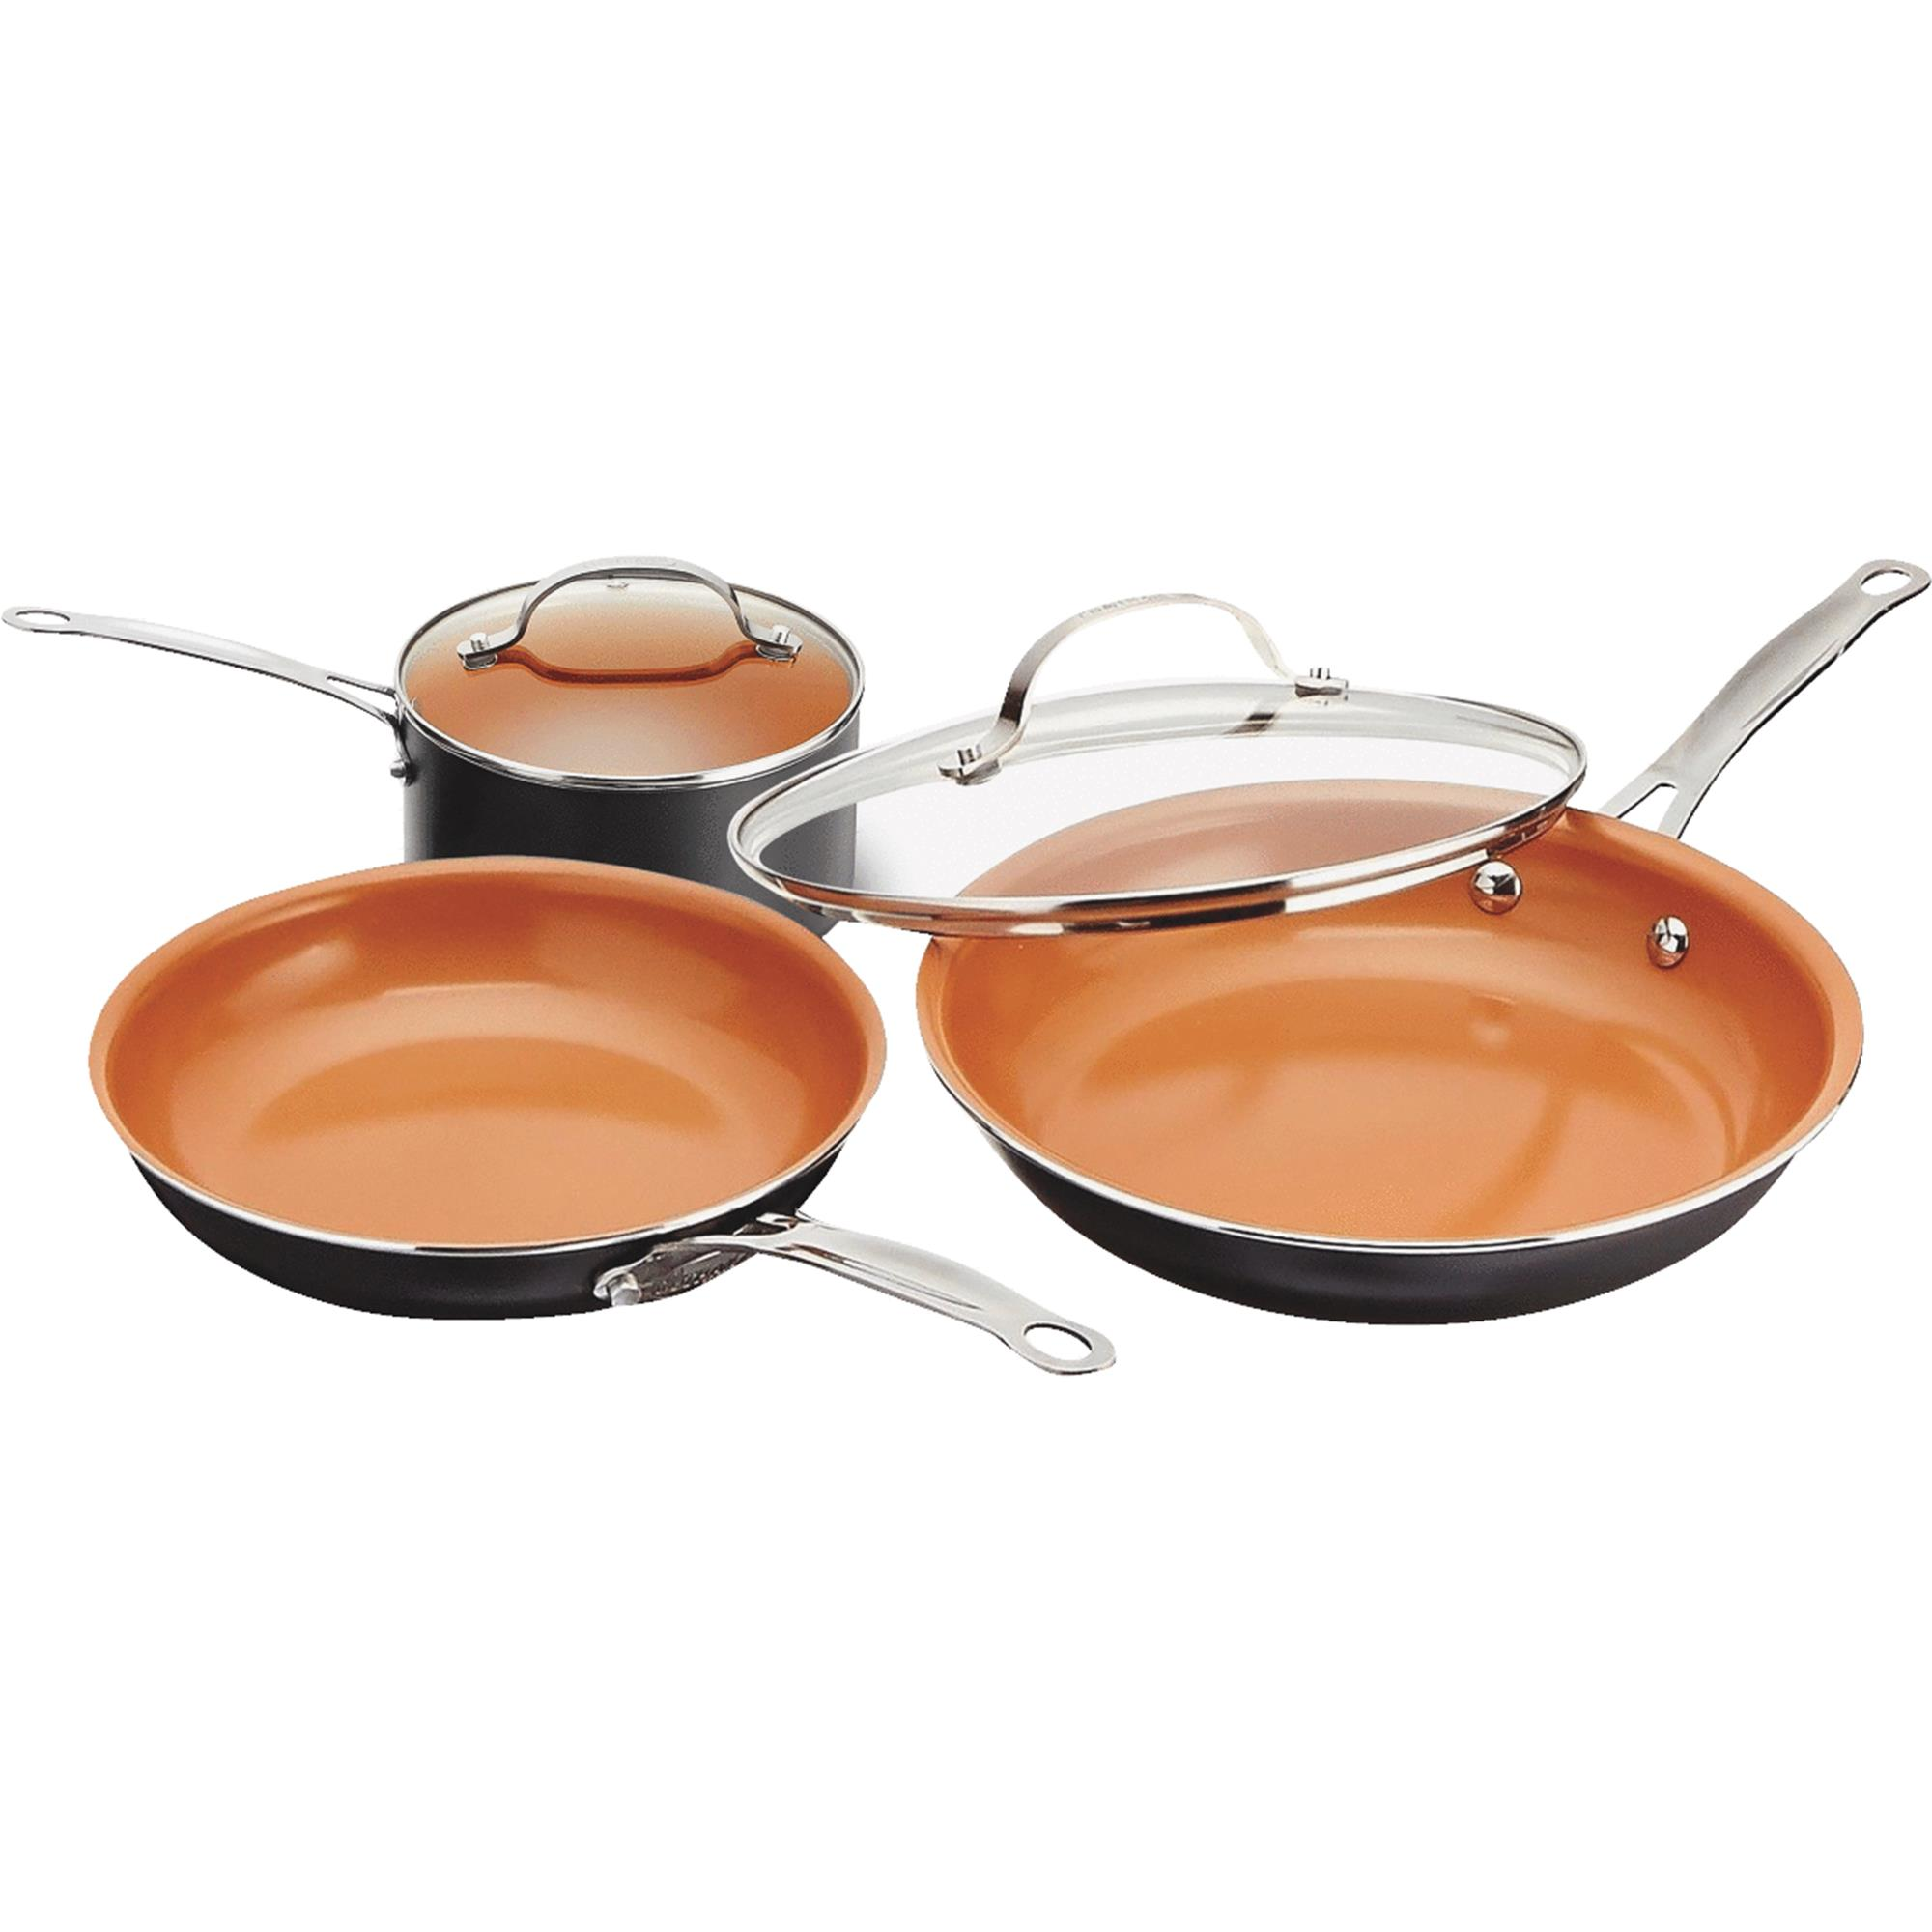 Gotham Steel 5-Piece Aluminum Round Cookware Set